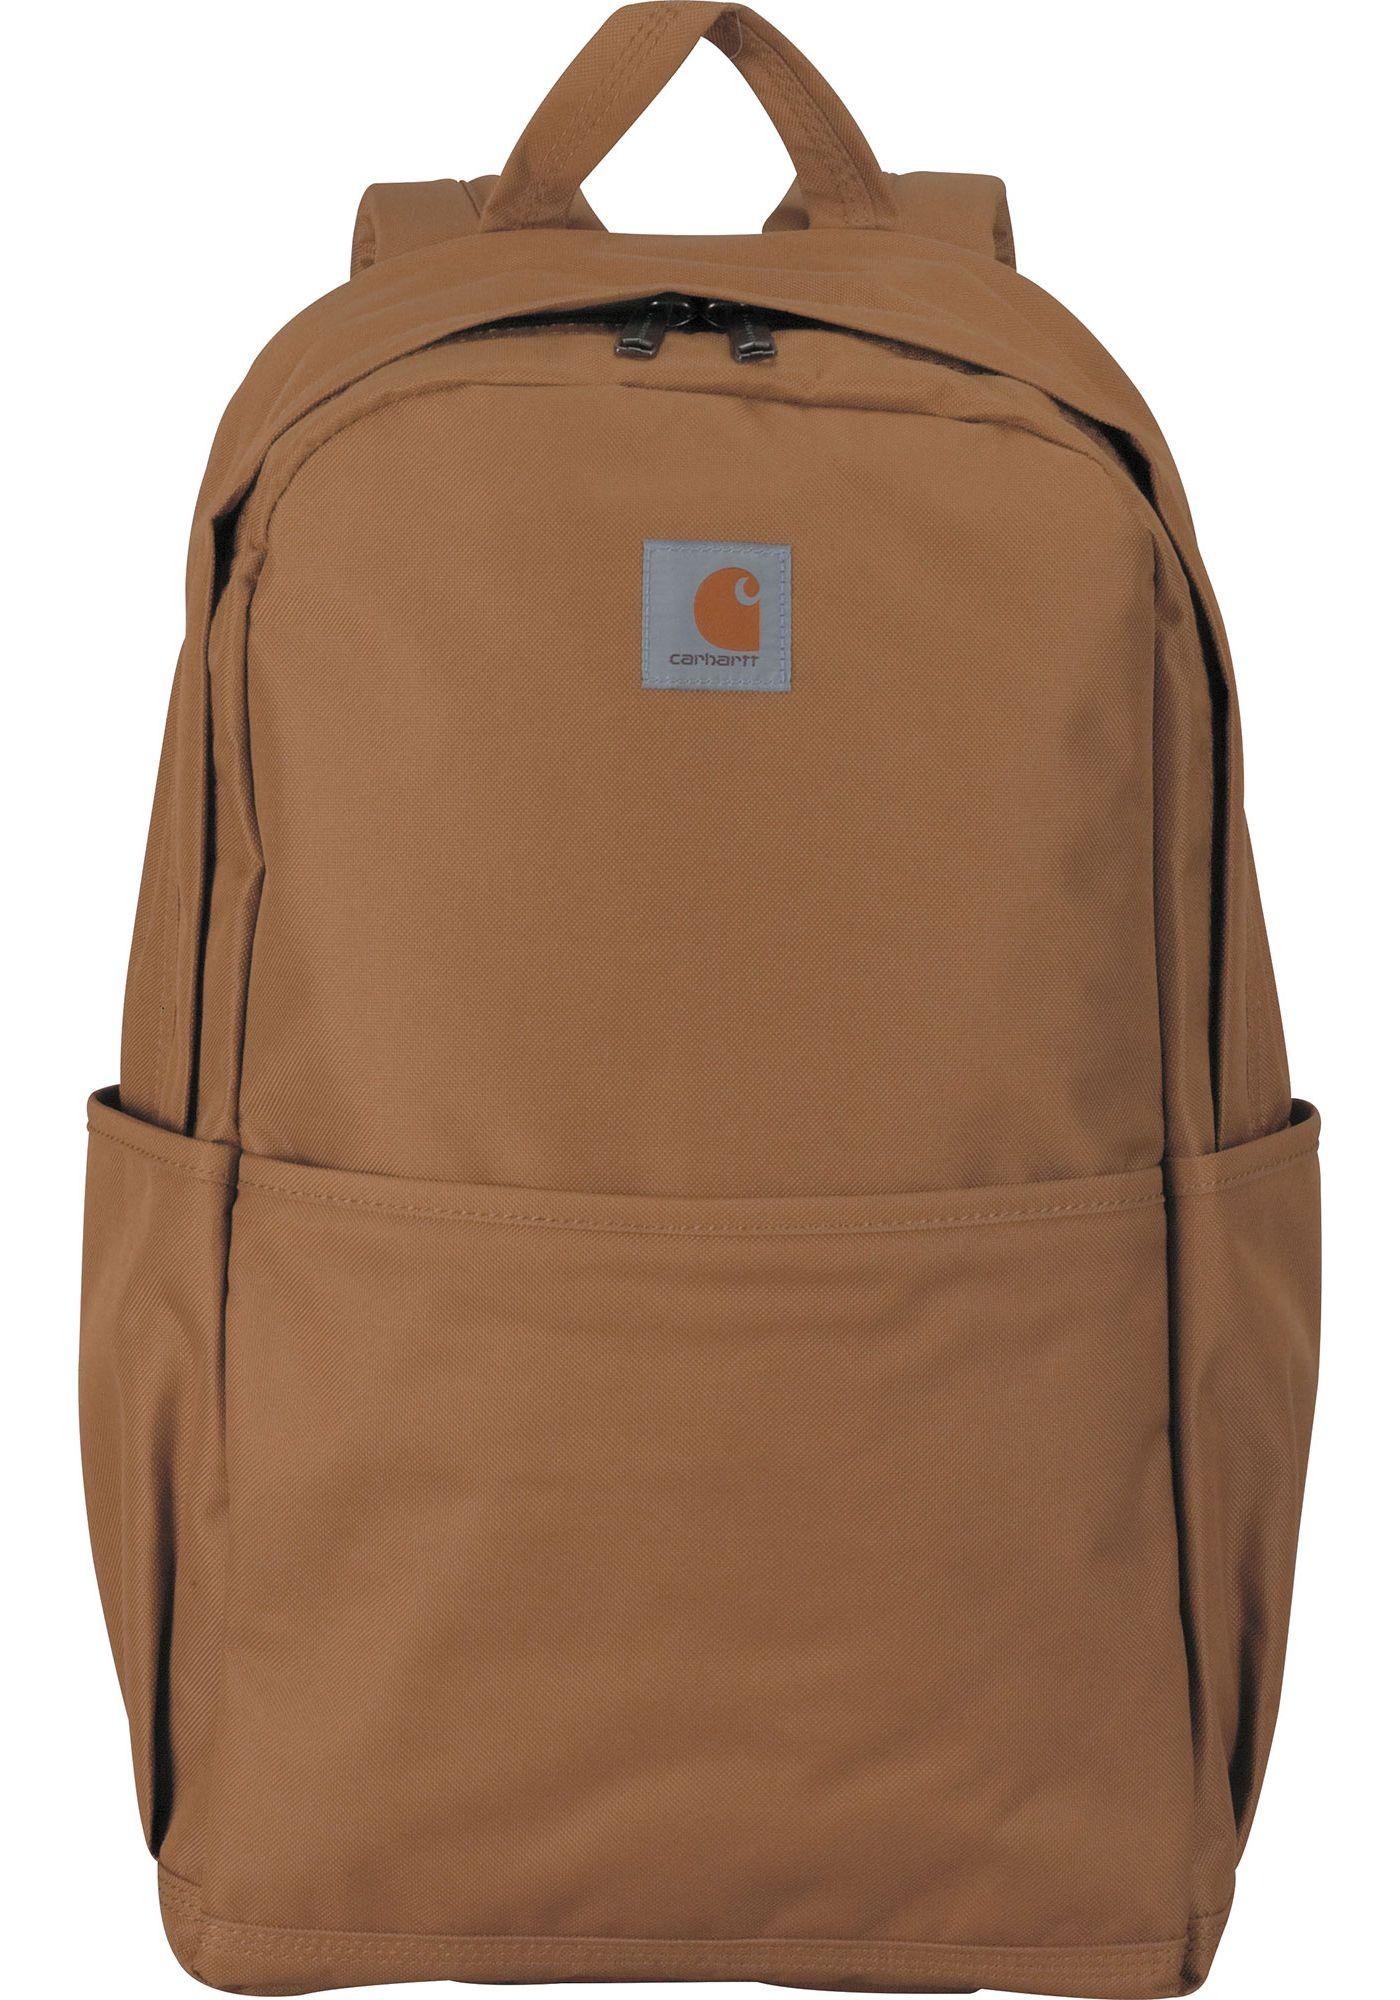 Carhartt Trade Plus Backpack